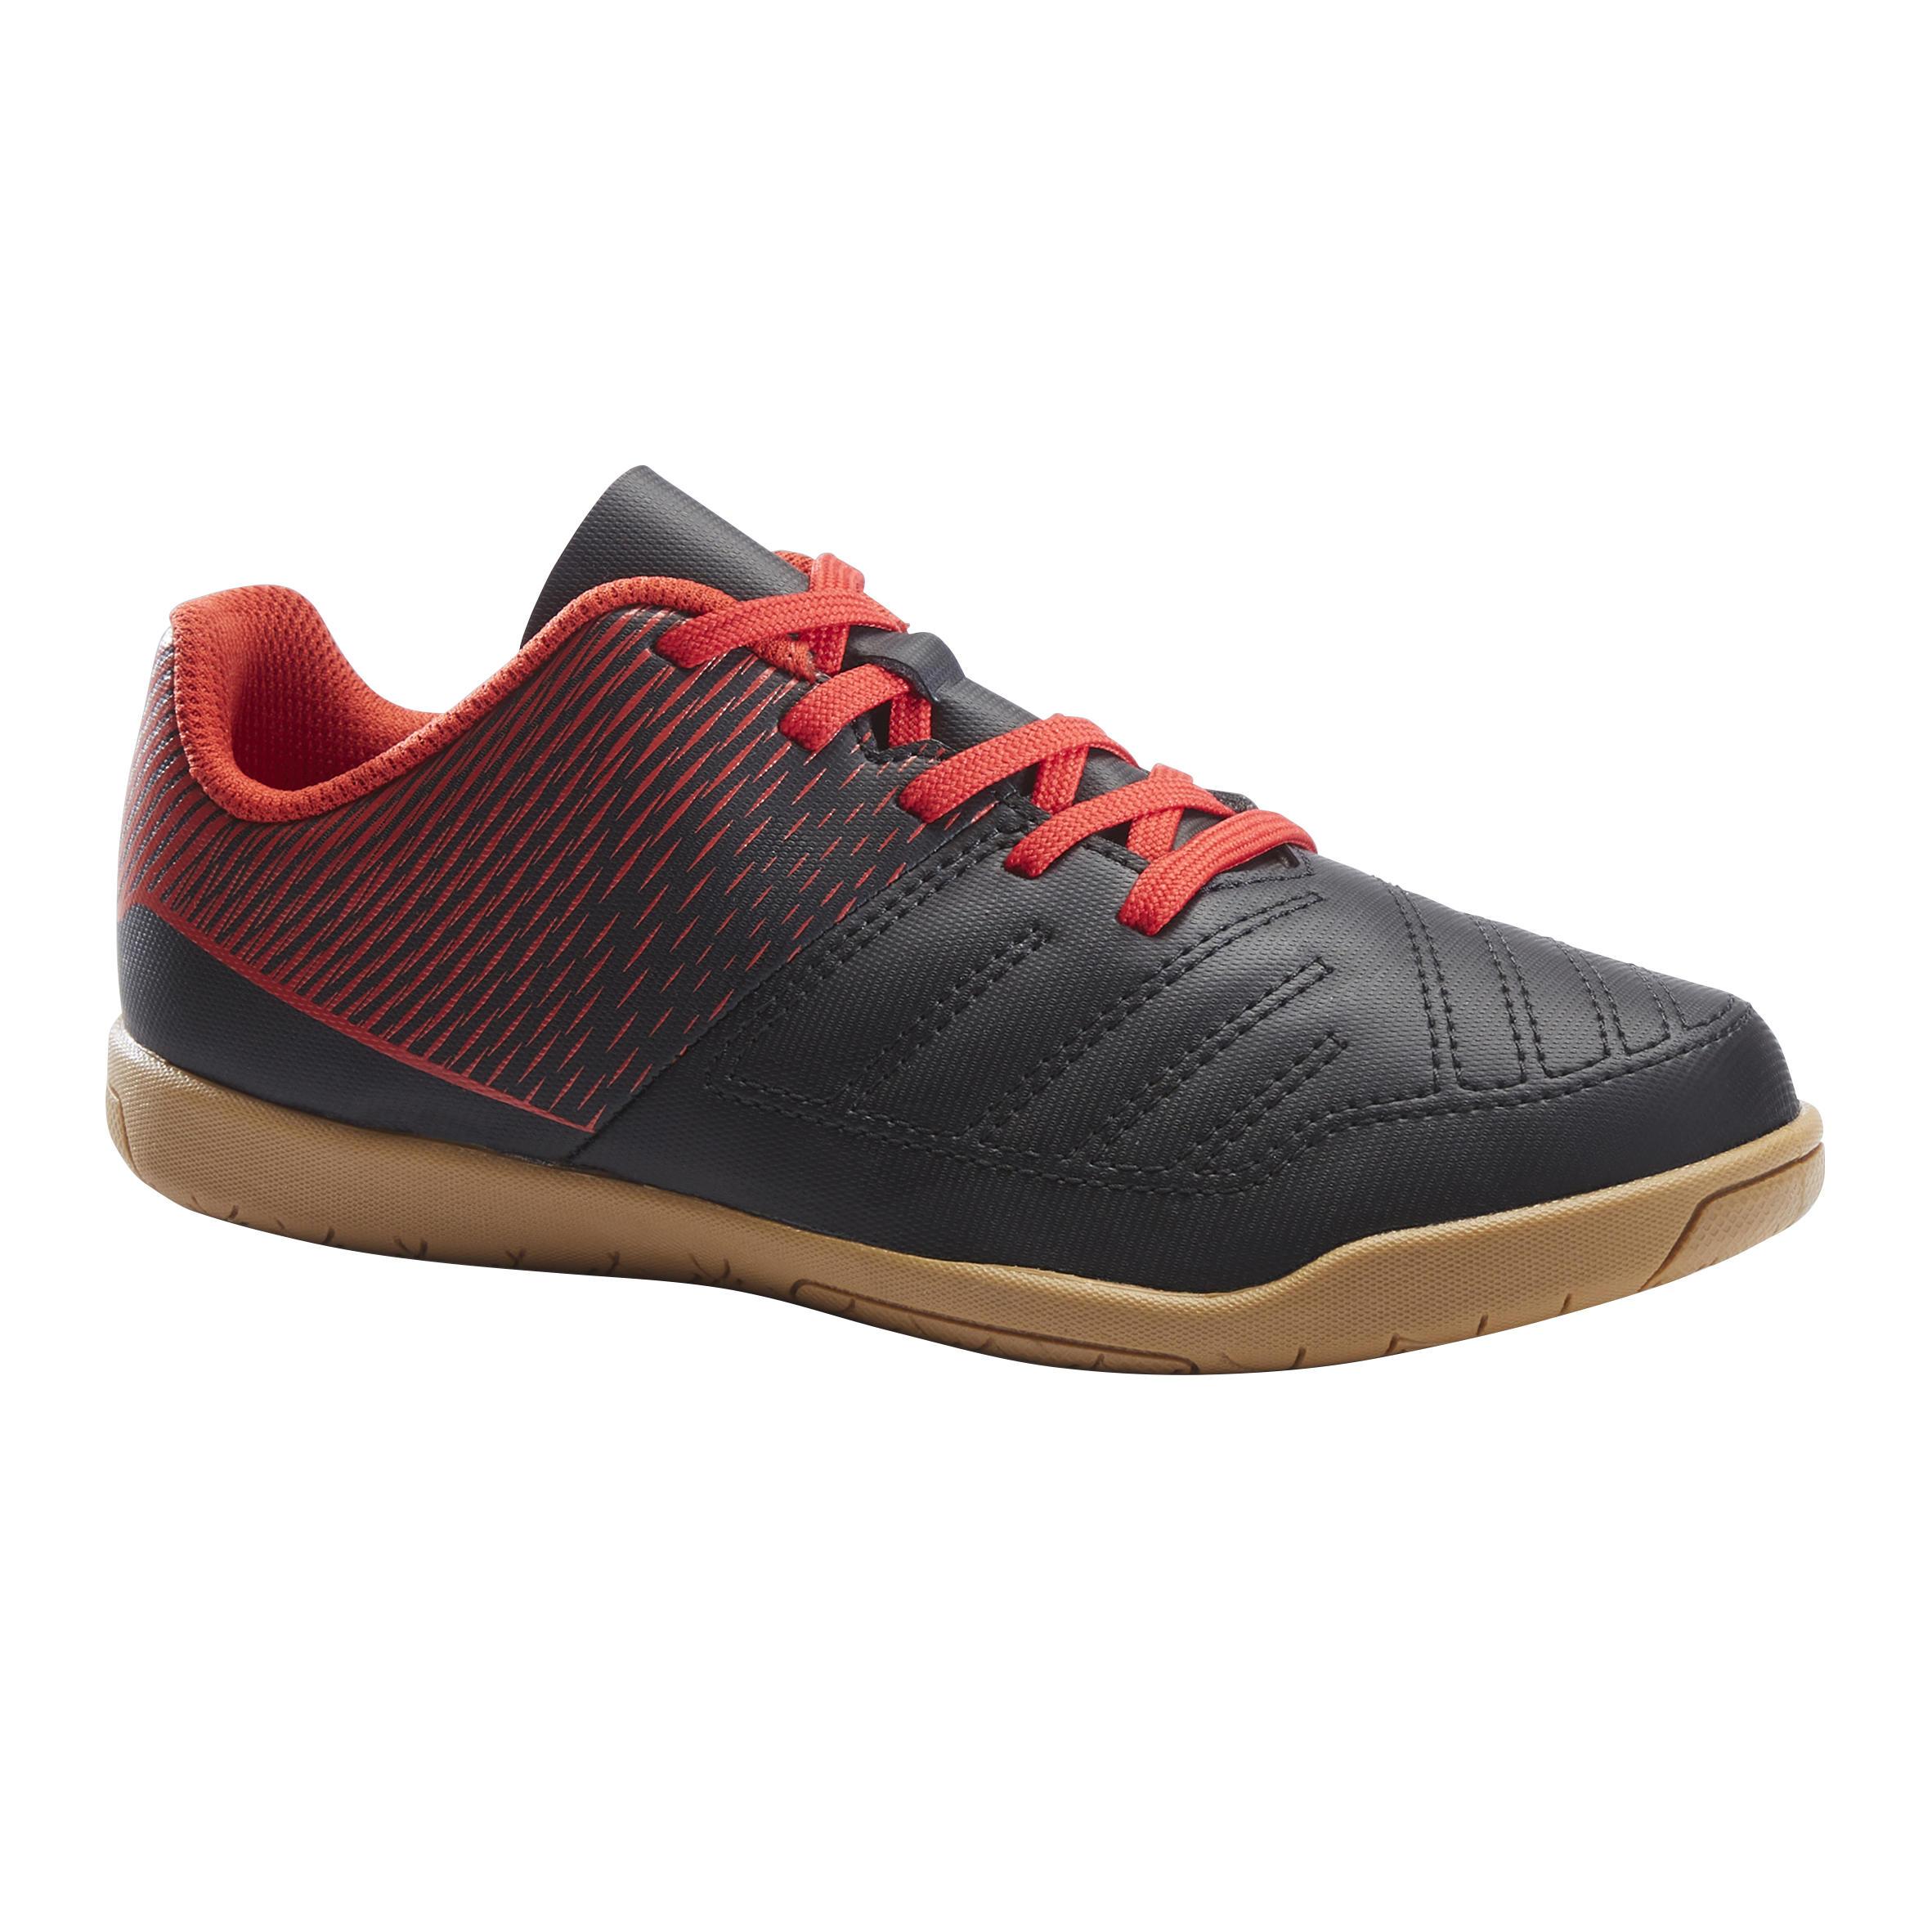 Ghete Futsal Agility 100 imagine